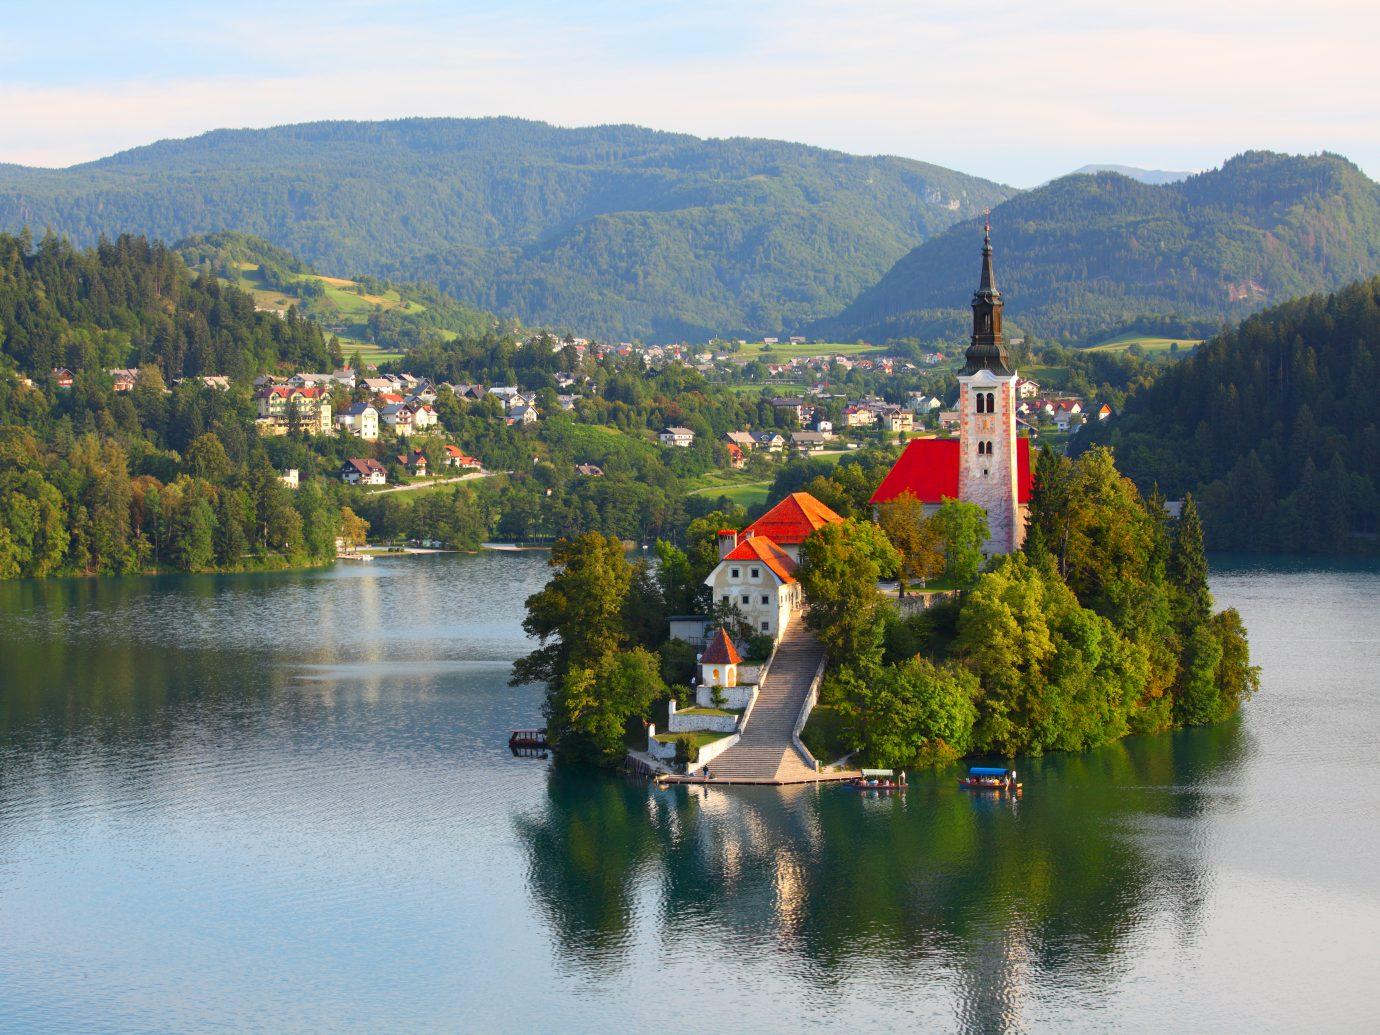 Santa Maria Church catholic church situated on an island on Bled lake